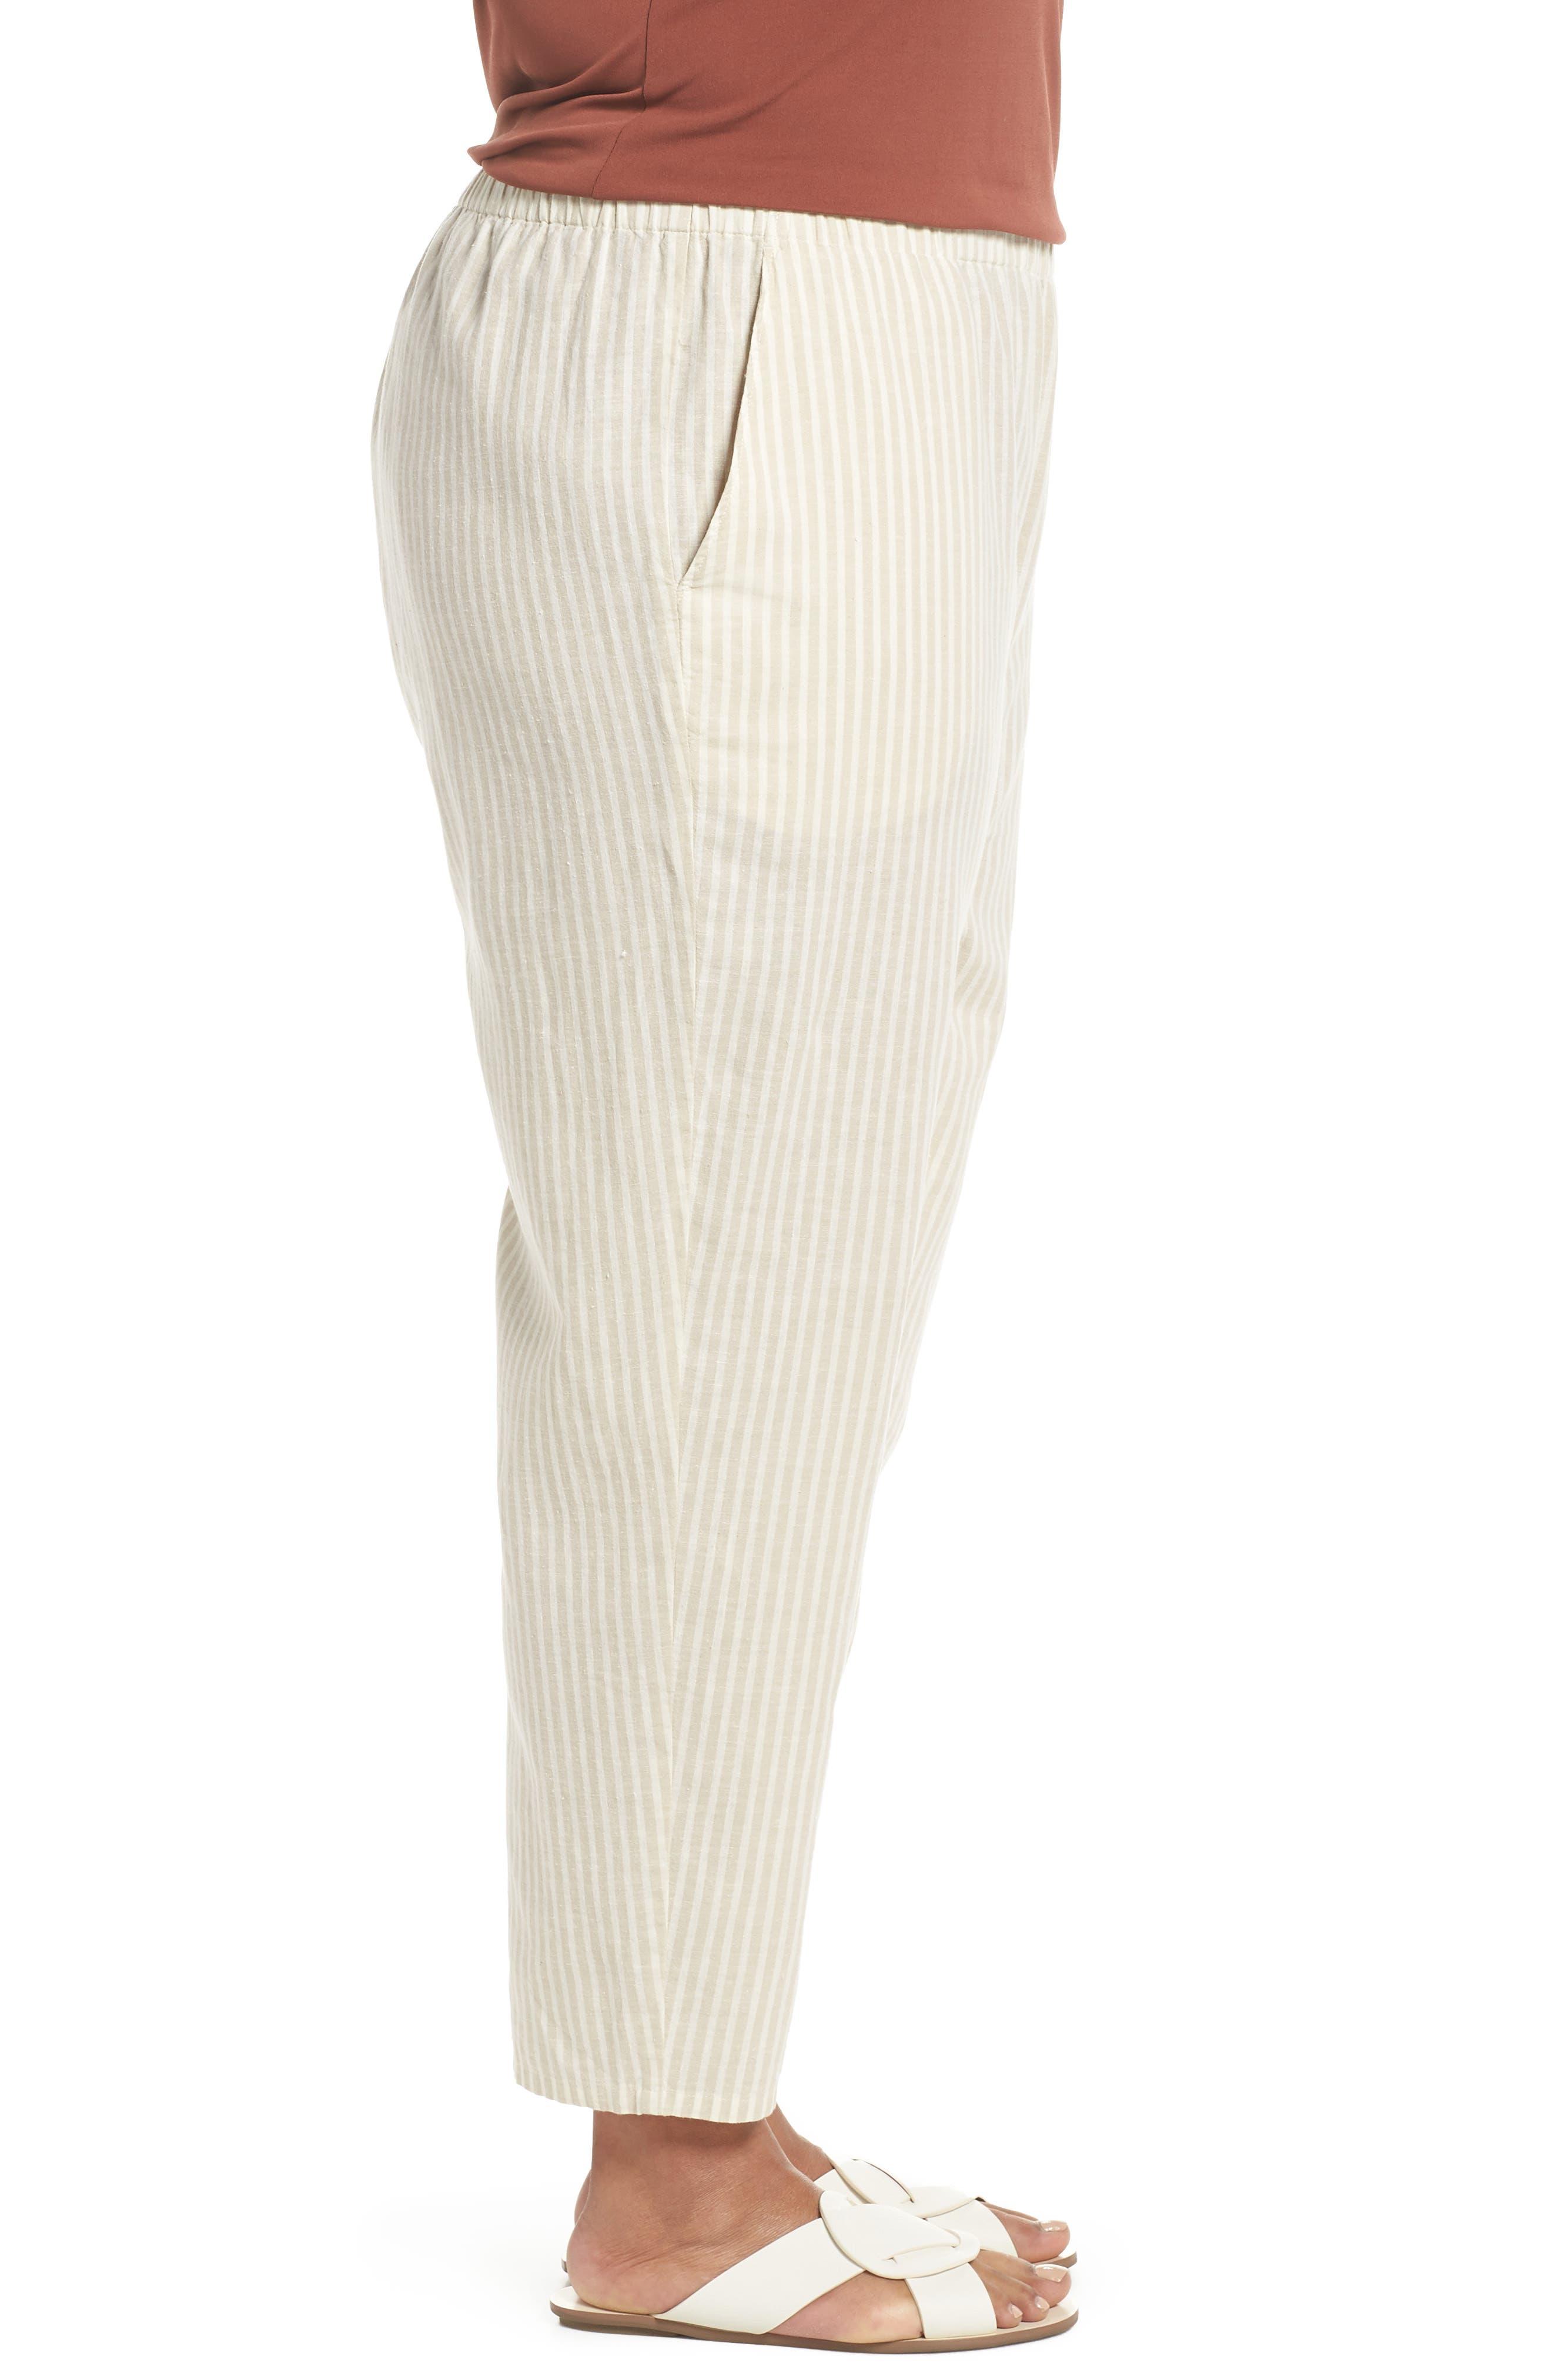 Stripe Ankle Hemp & Cotton Pants,                             Alternate thumbnail 3, color,                             257